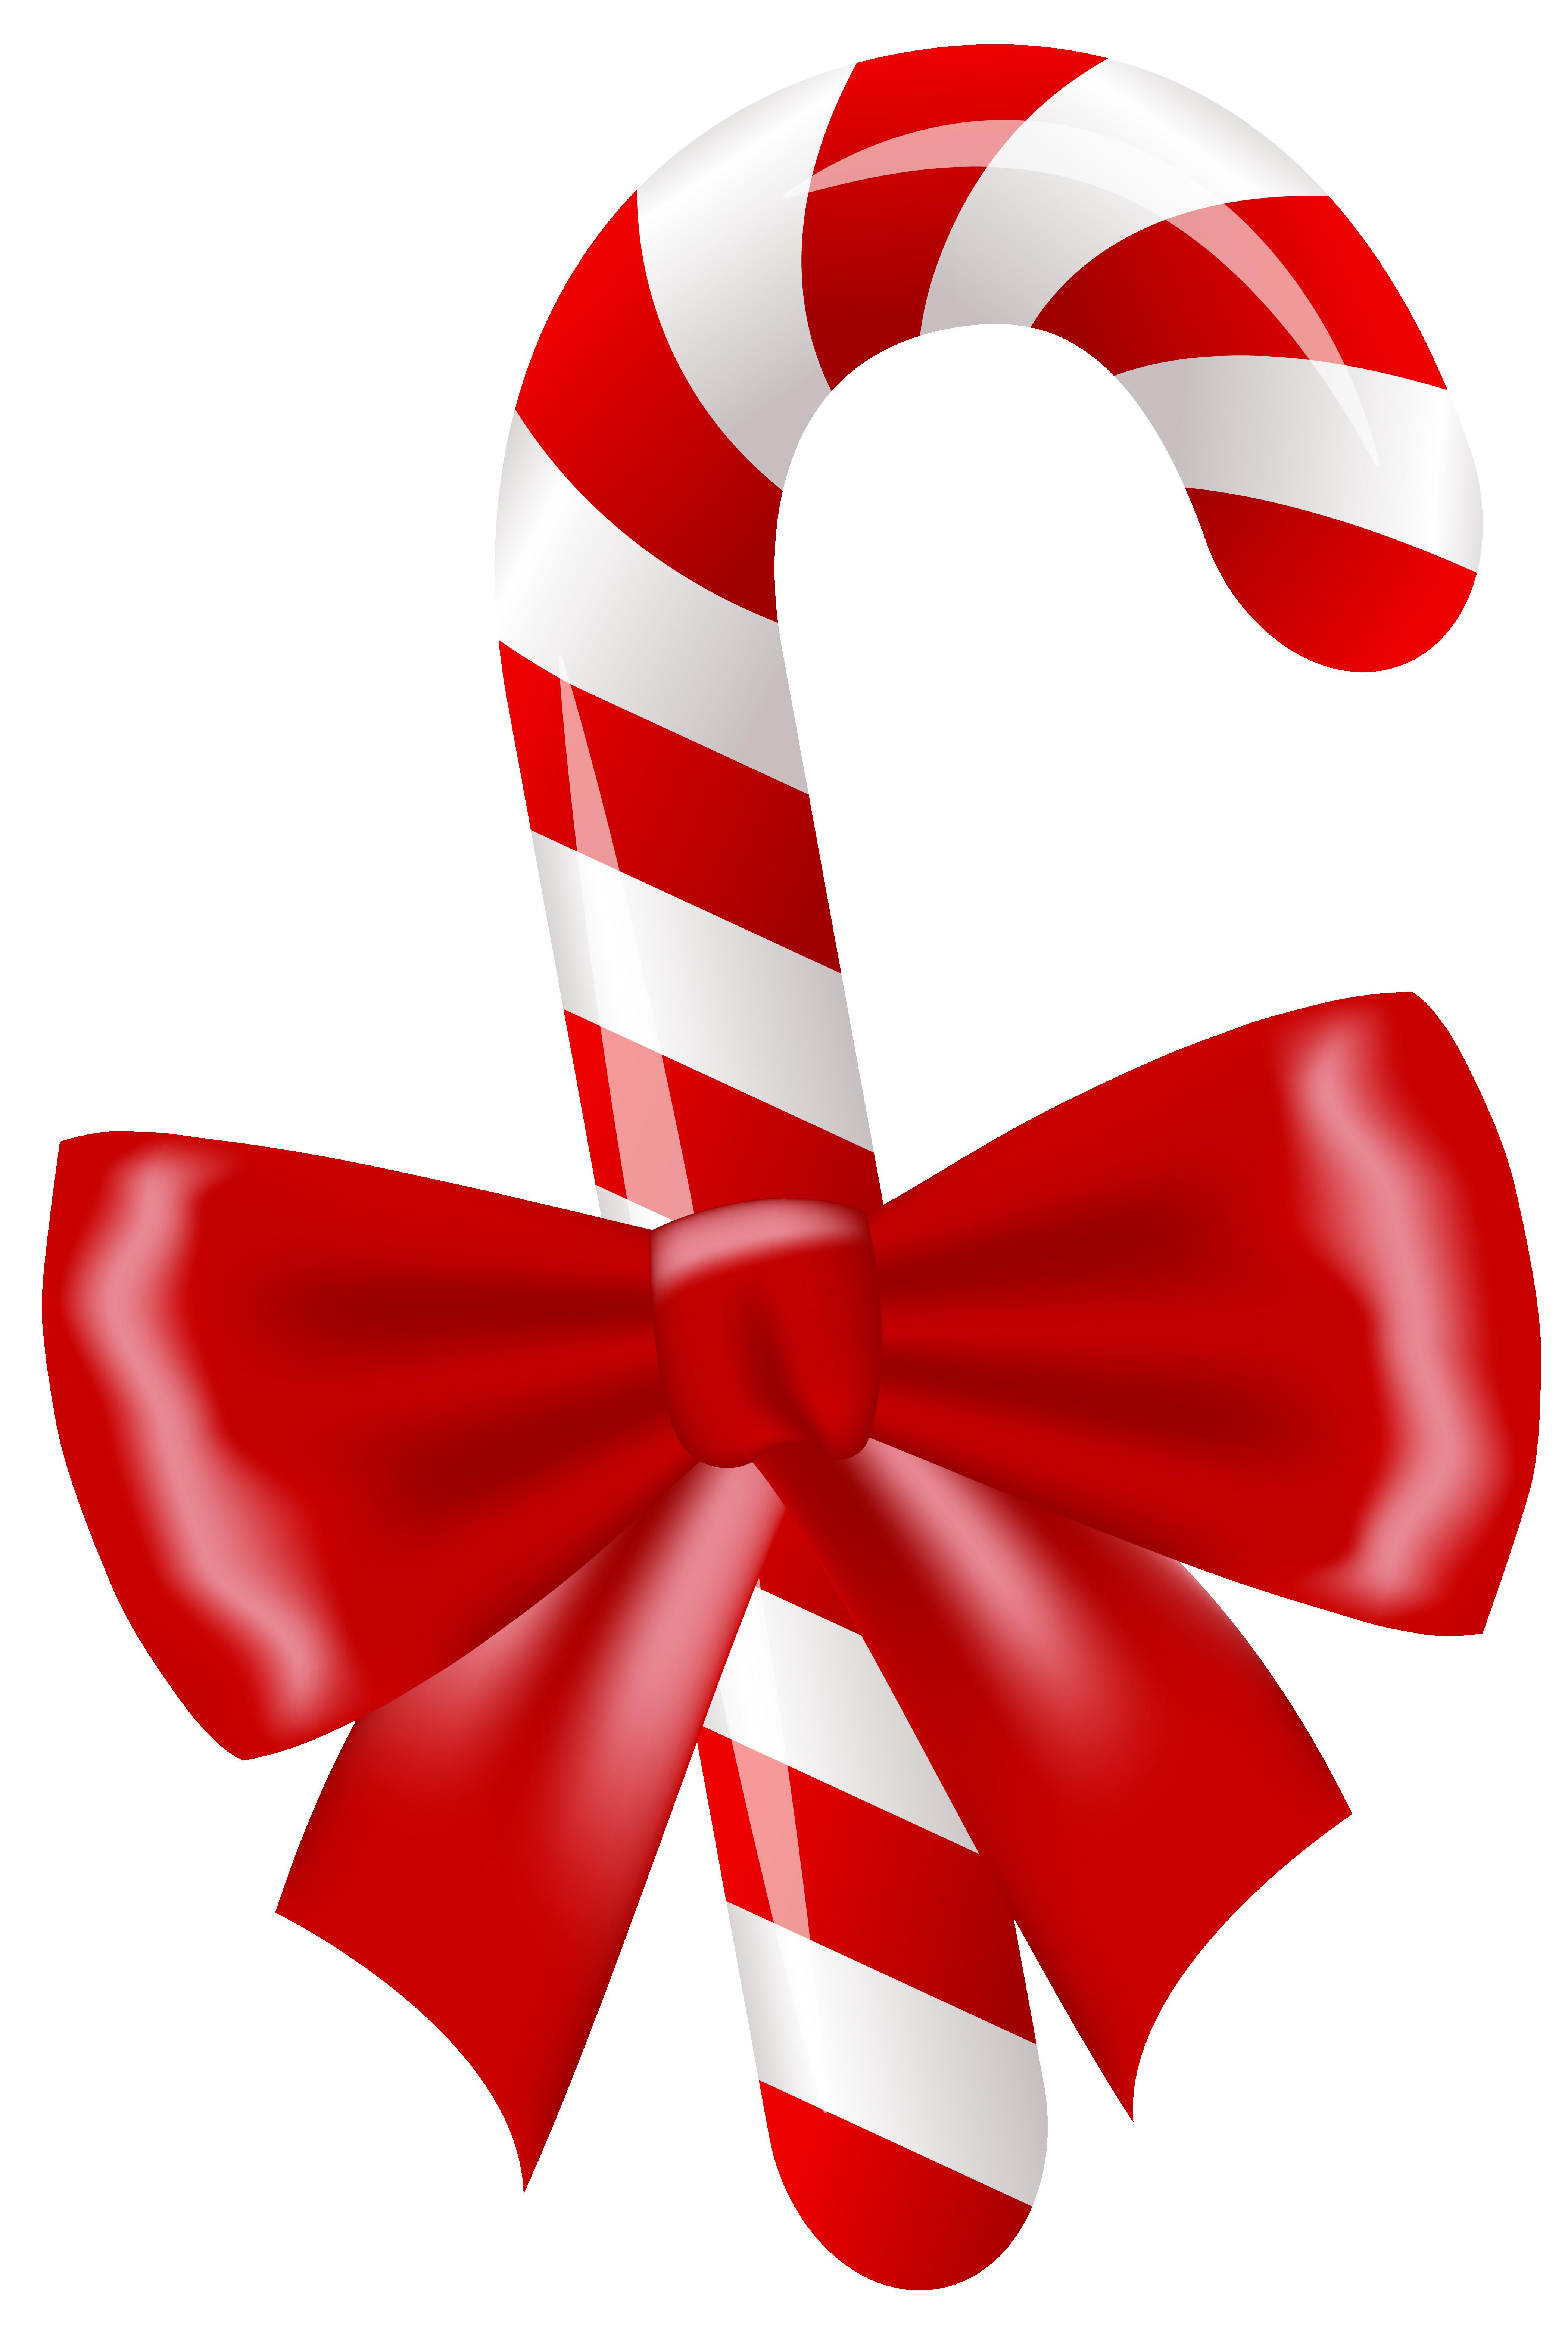 Candy Cane Christmas  Christmas candy cane image black and white techFlourish